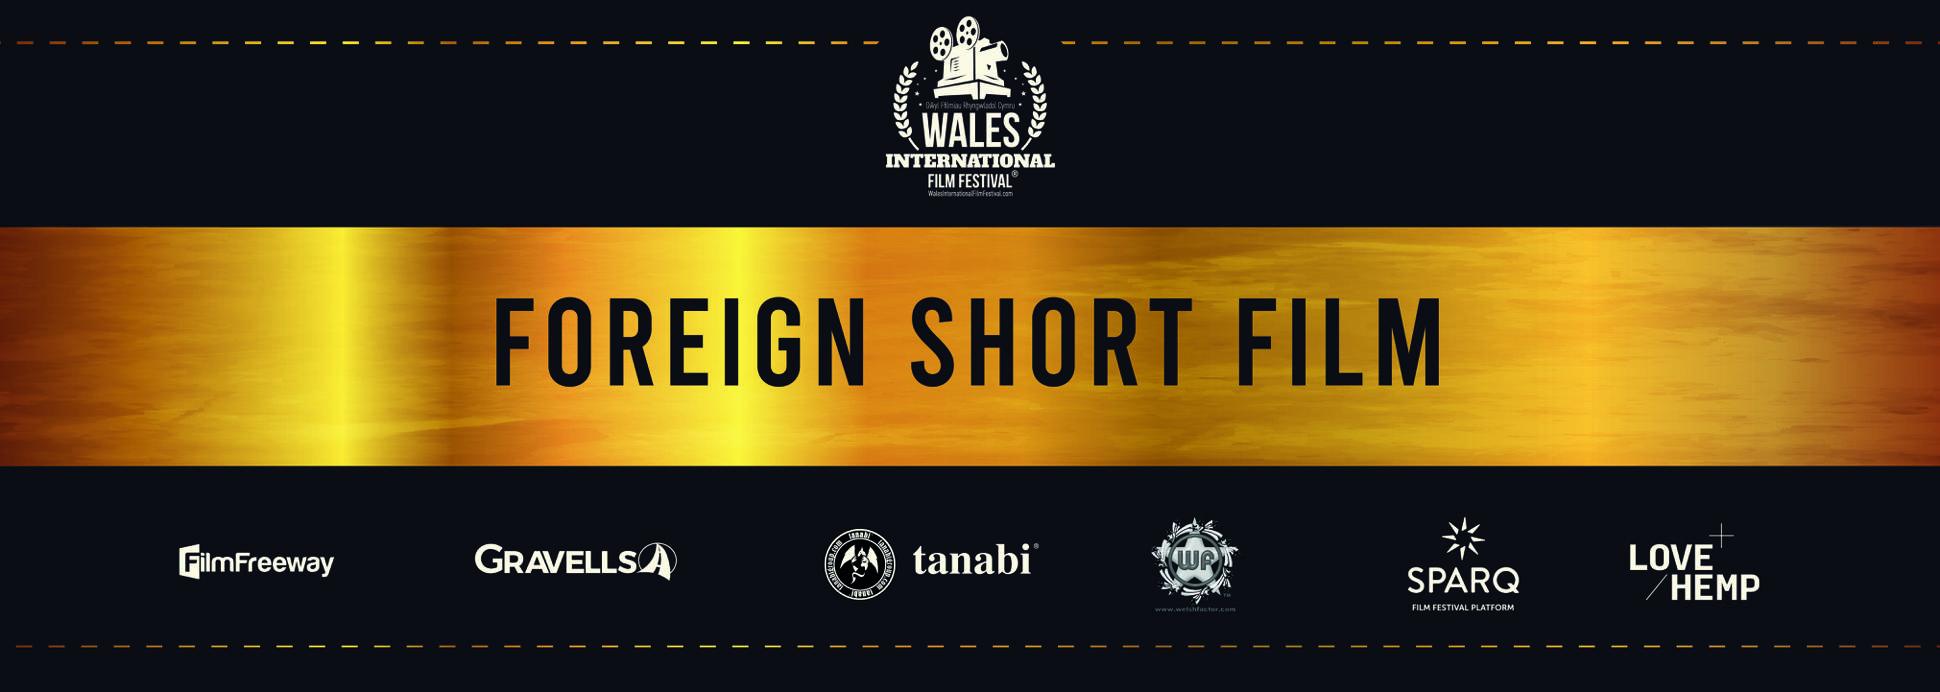 Foreign Short Film